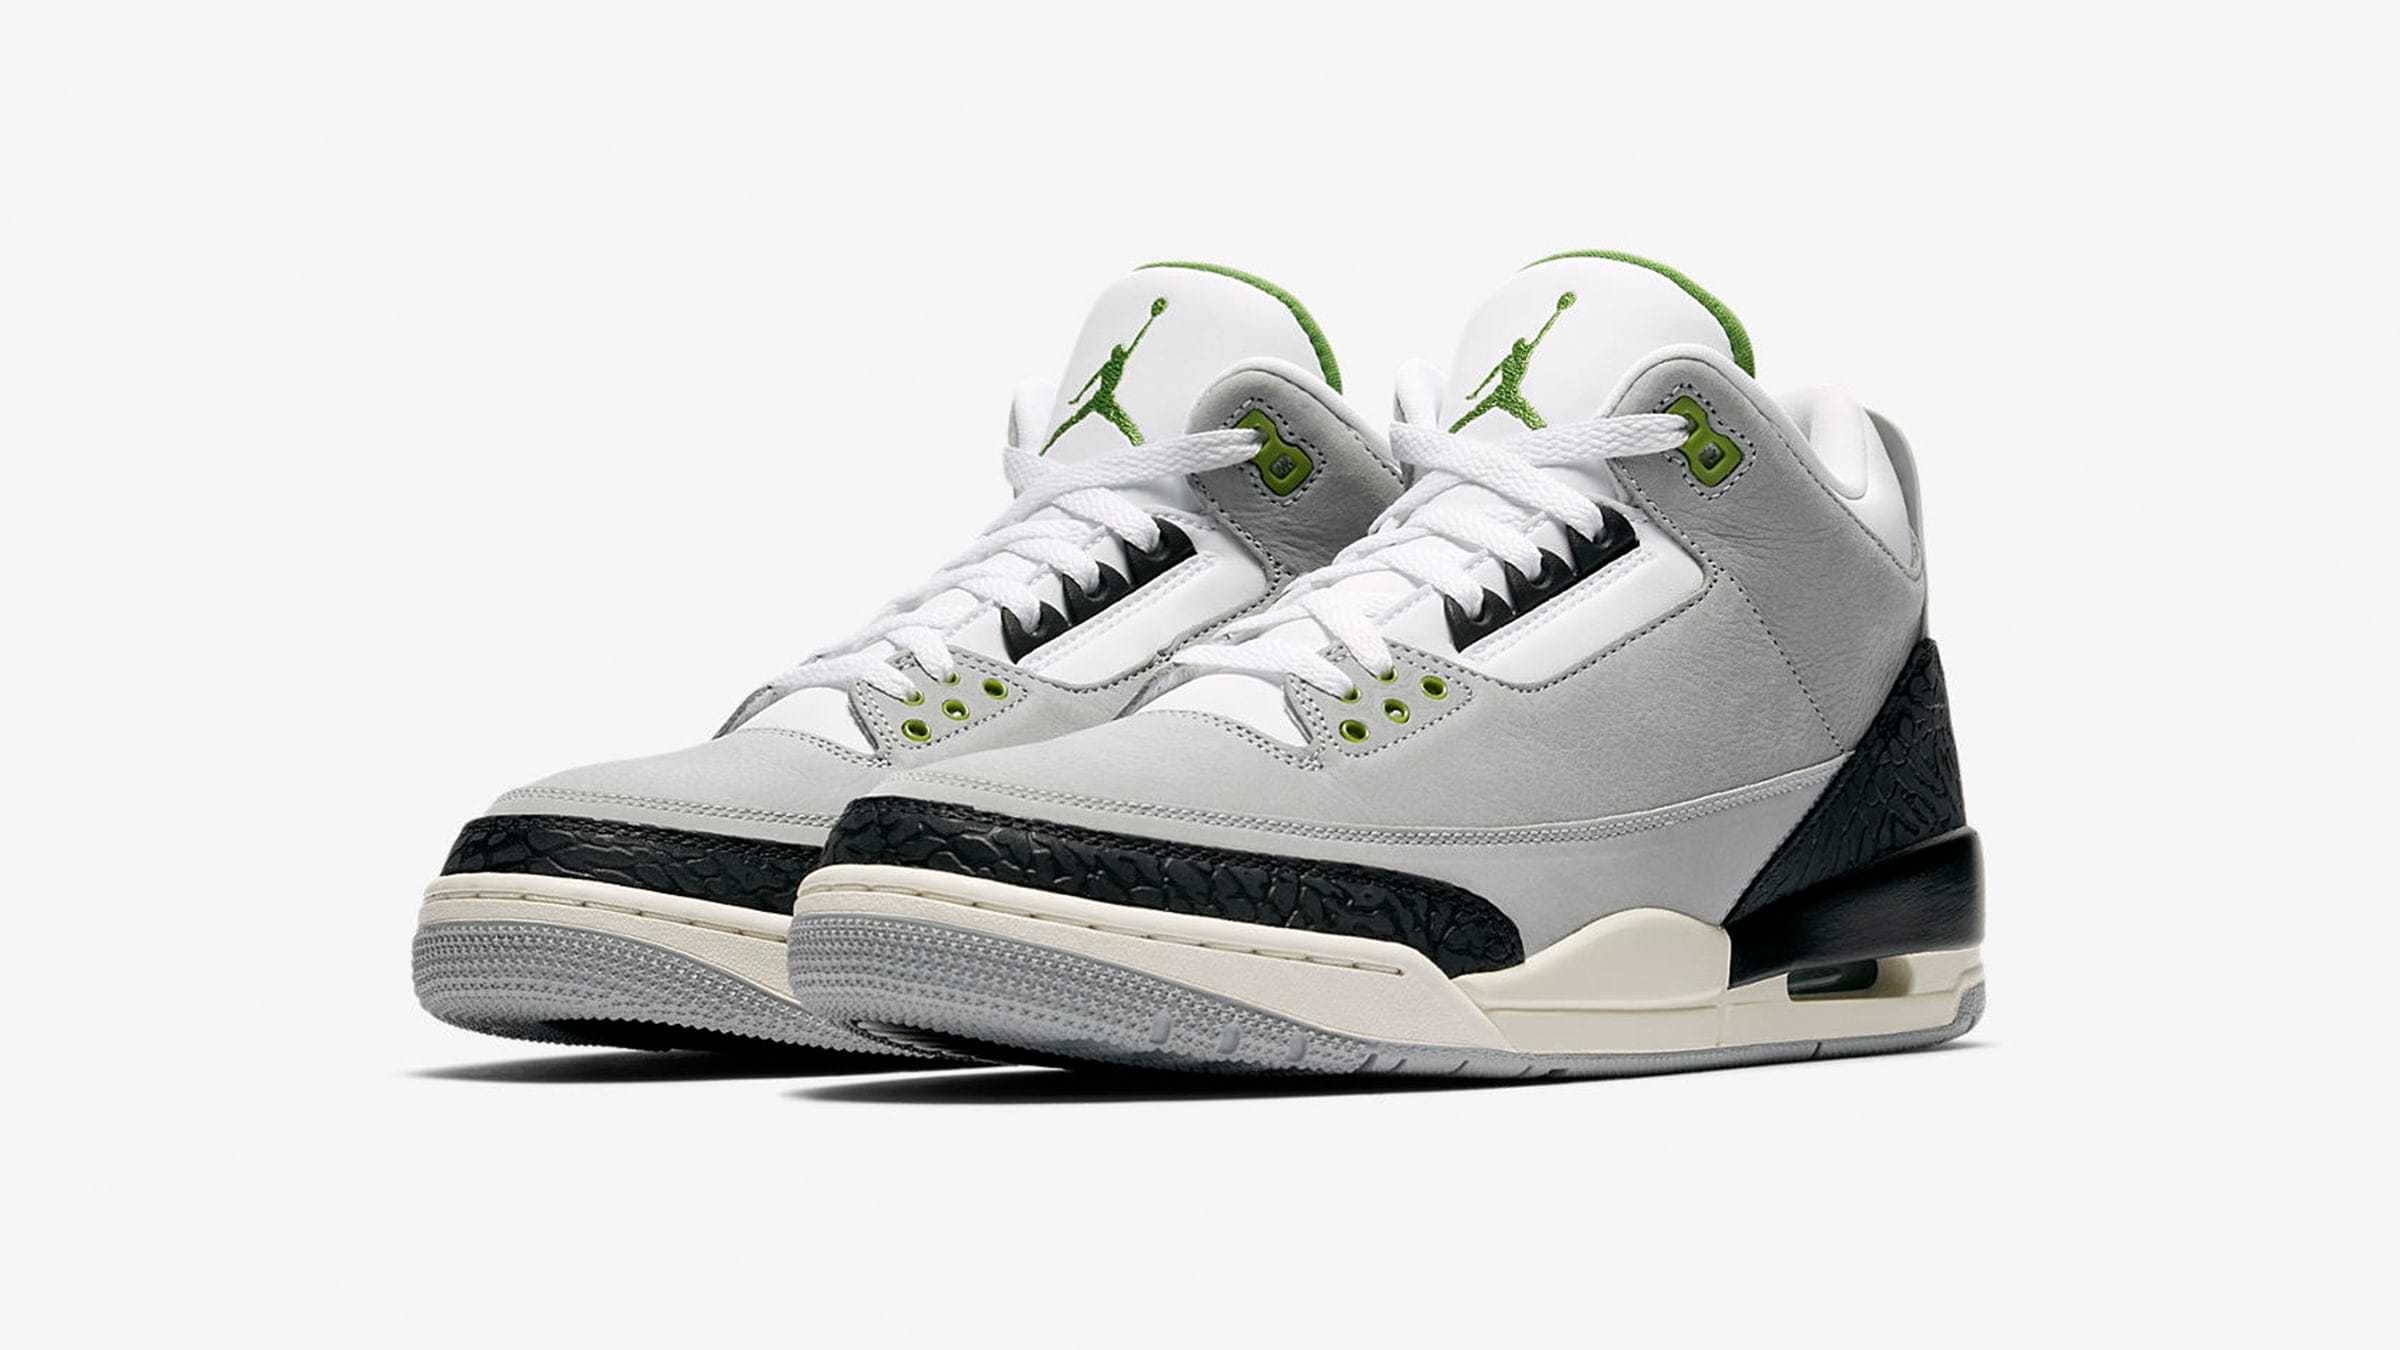 meet 9b440 fdbc1 END. Features   Nike Air Jordan 3 'MJ x Tinker' - Register ...